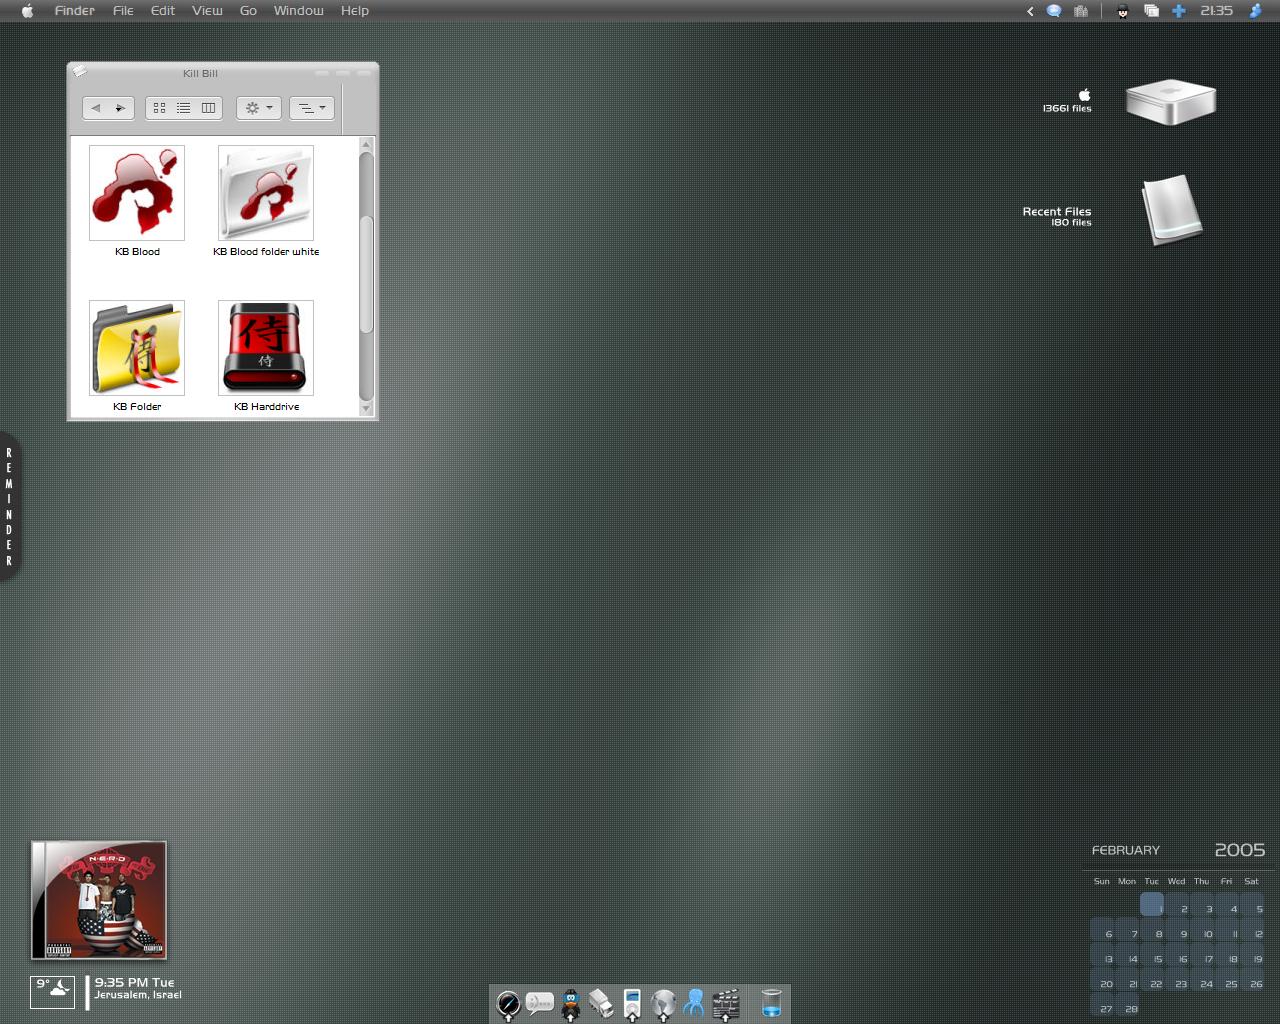 February 1 Desktop ScreenShot